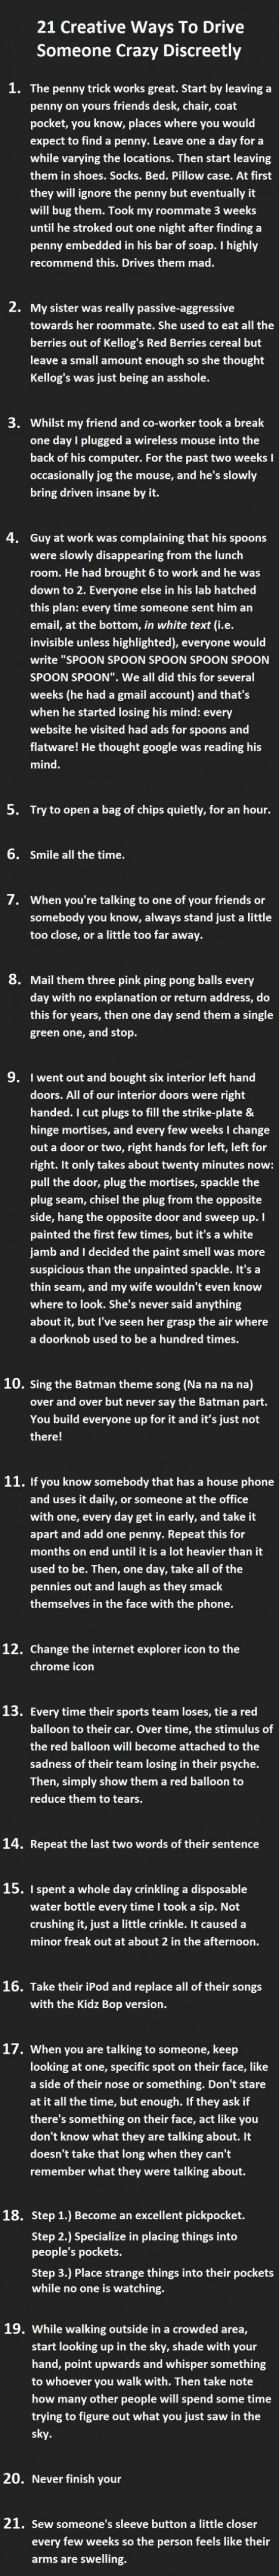 21 ways to drive someone crazy.